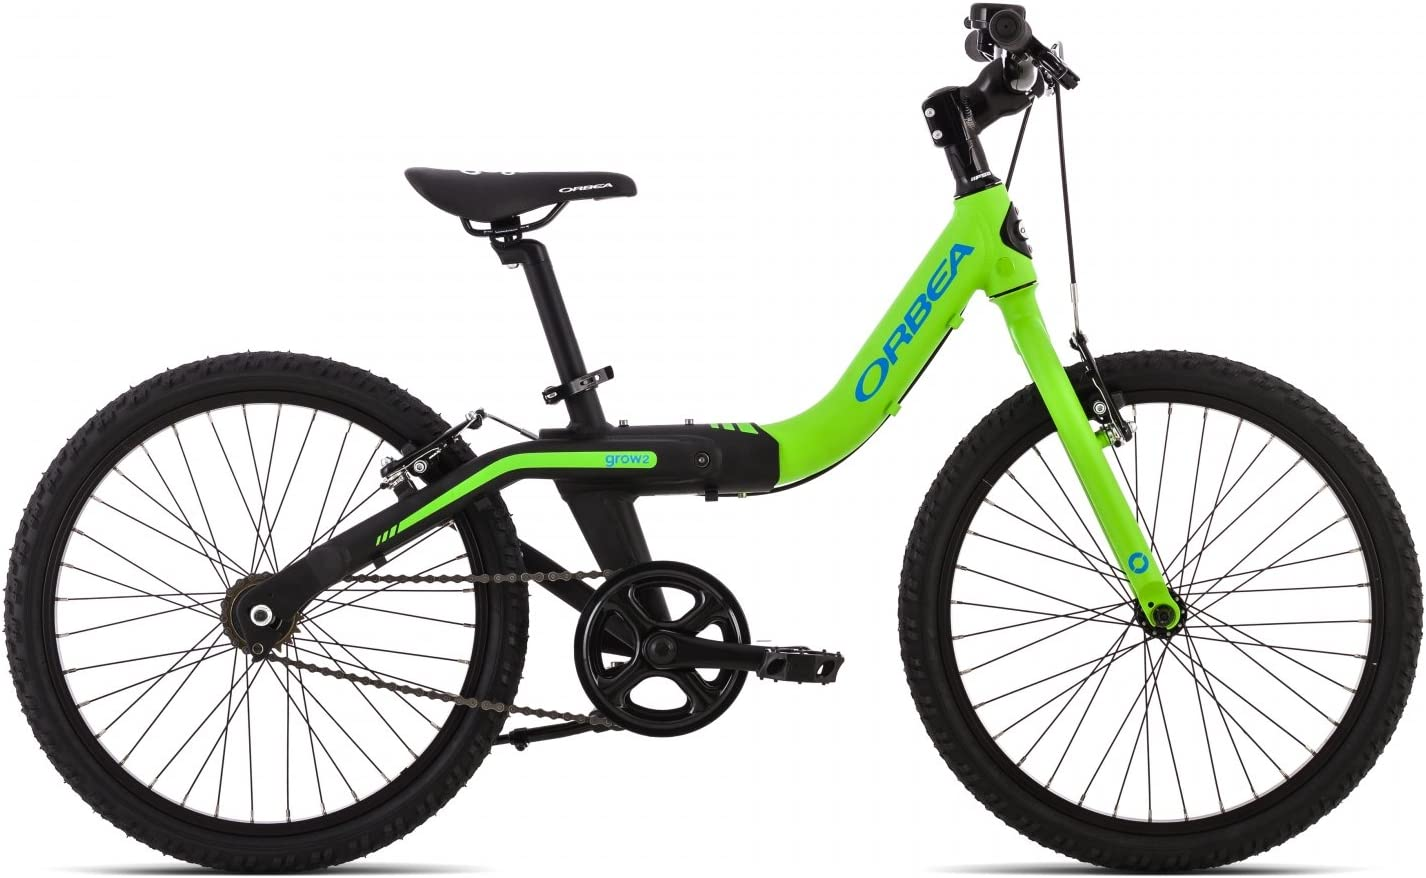 ORBEA Bicicleta Infantil Grow 2, 1 velocidad, verde: Amazon.es ...